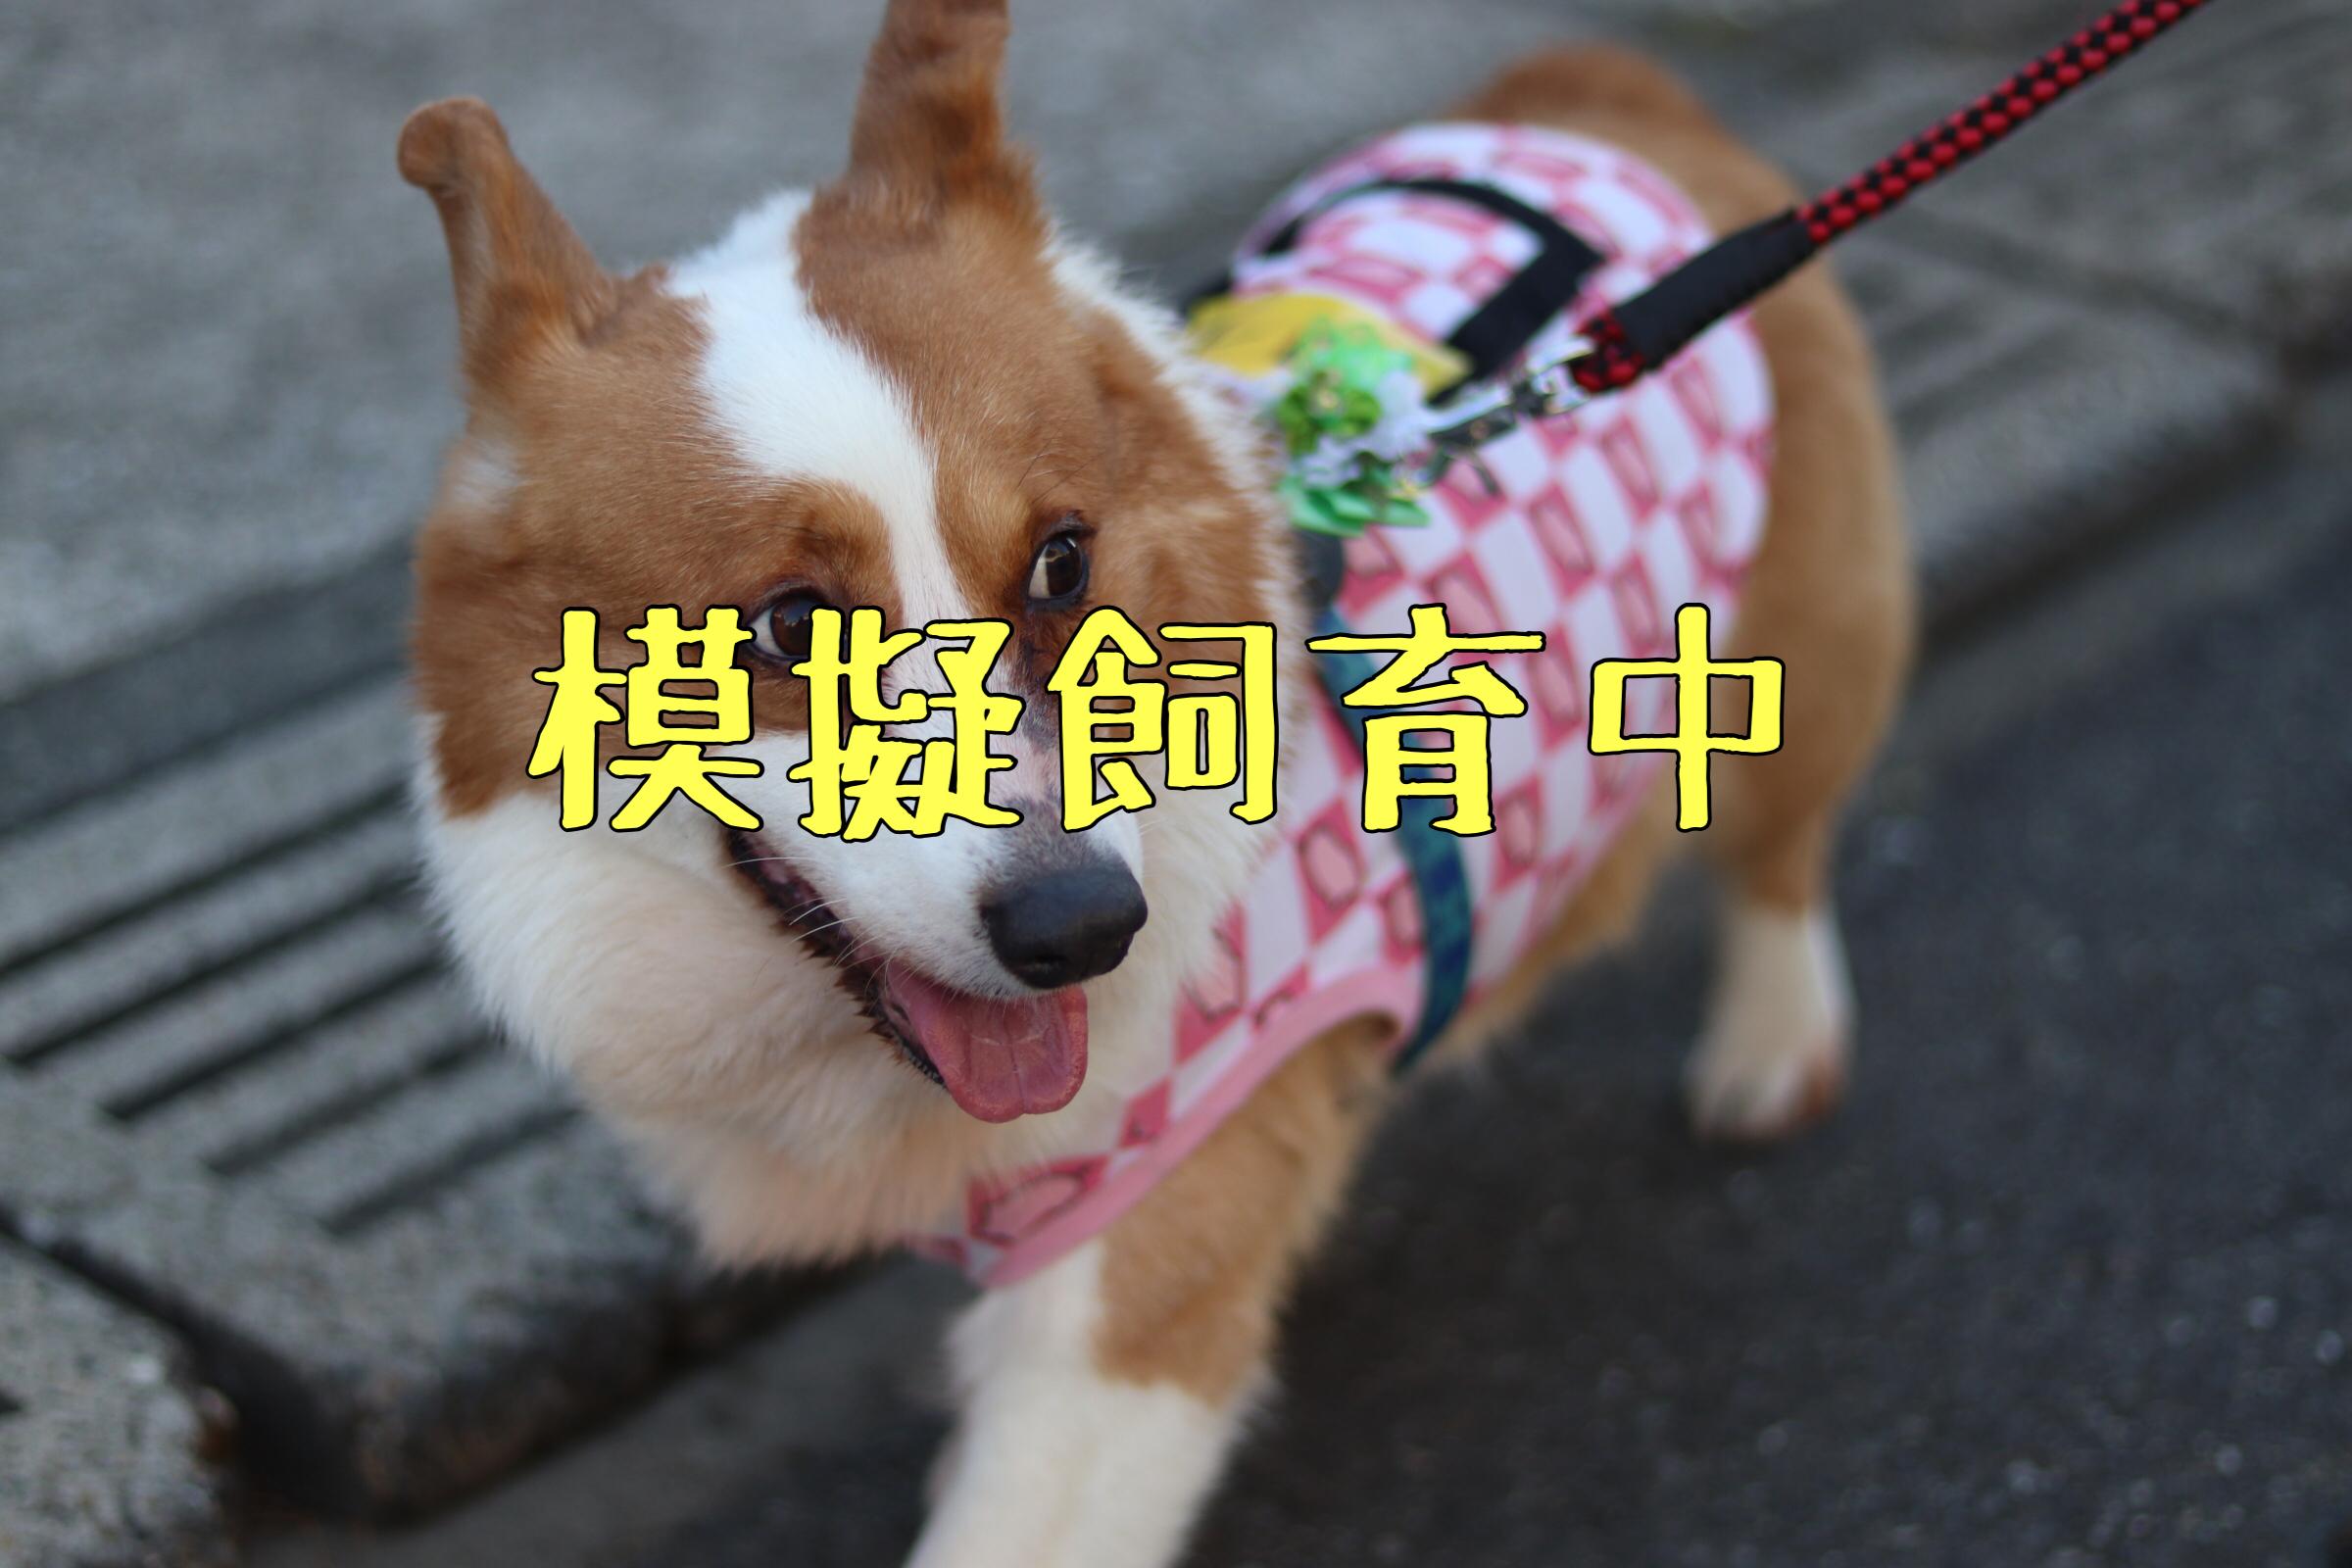 <ul> <li>犬種:ウェルシュコーギー</li> <li>性別:男の子</li> <li>名前:カイ</li> <li>年齢:2010年生まれ</li> <li>保護経緯:離婚のため飼育困難</li> </ul>